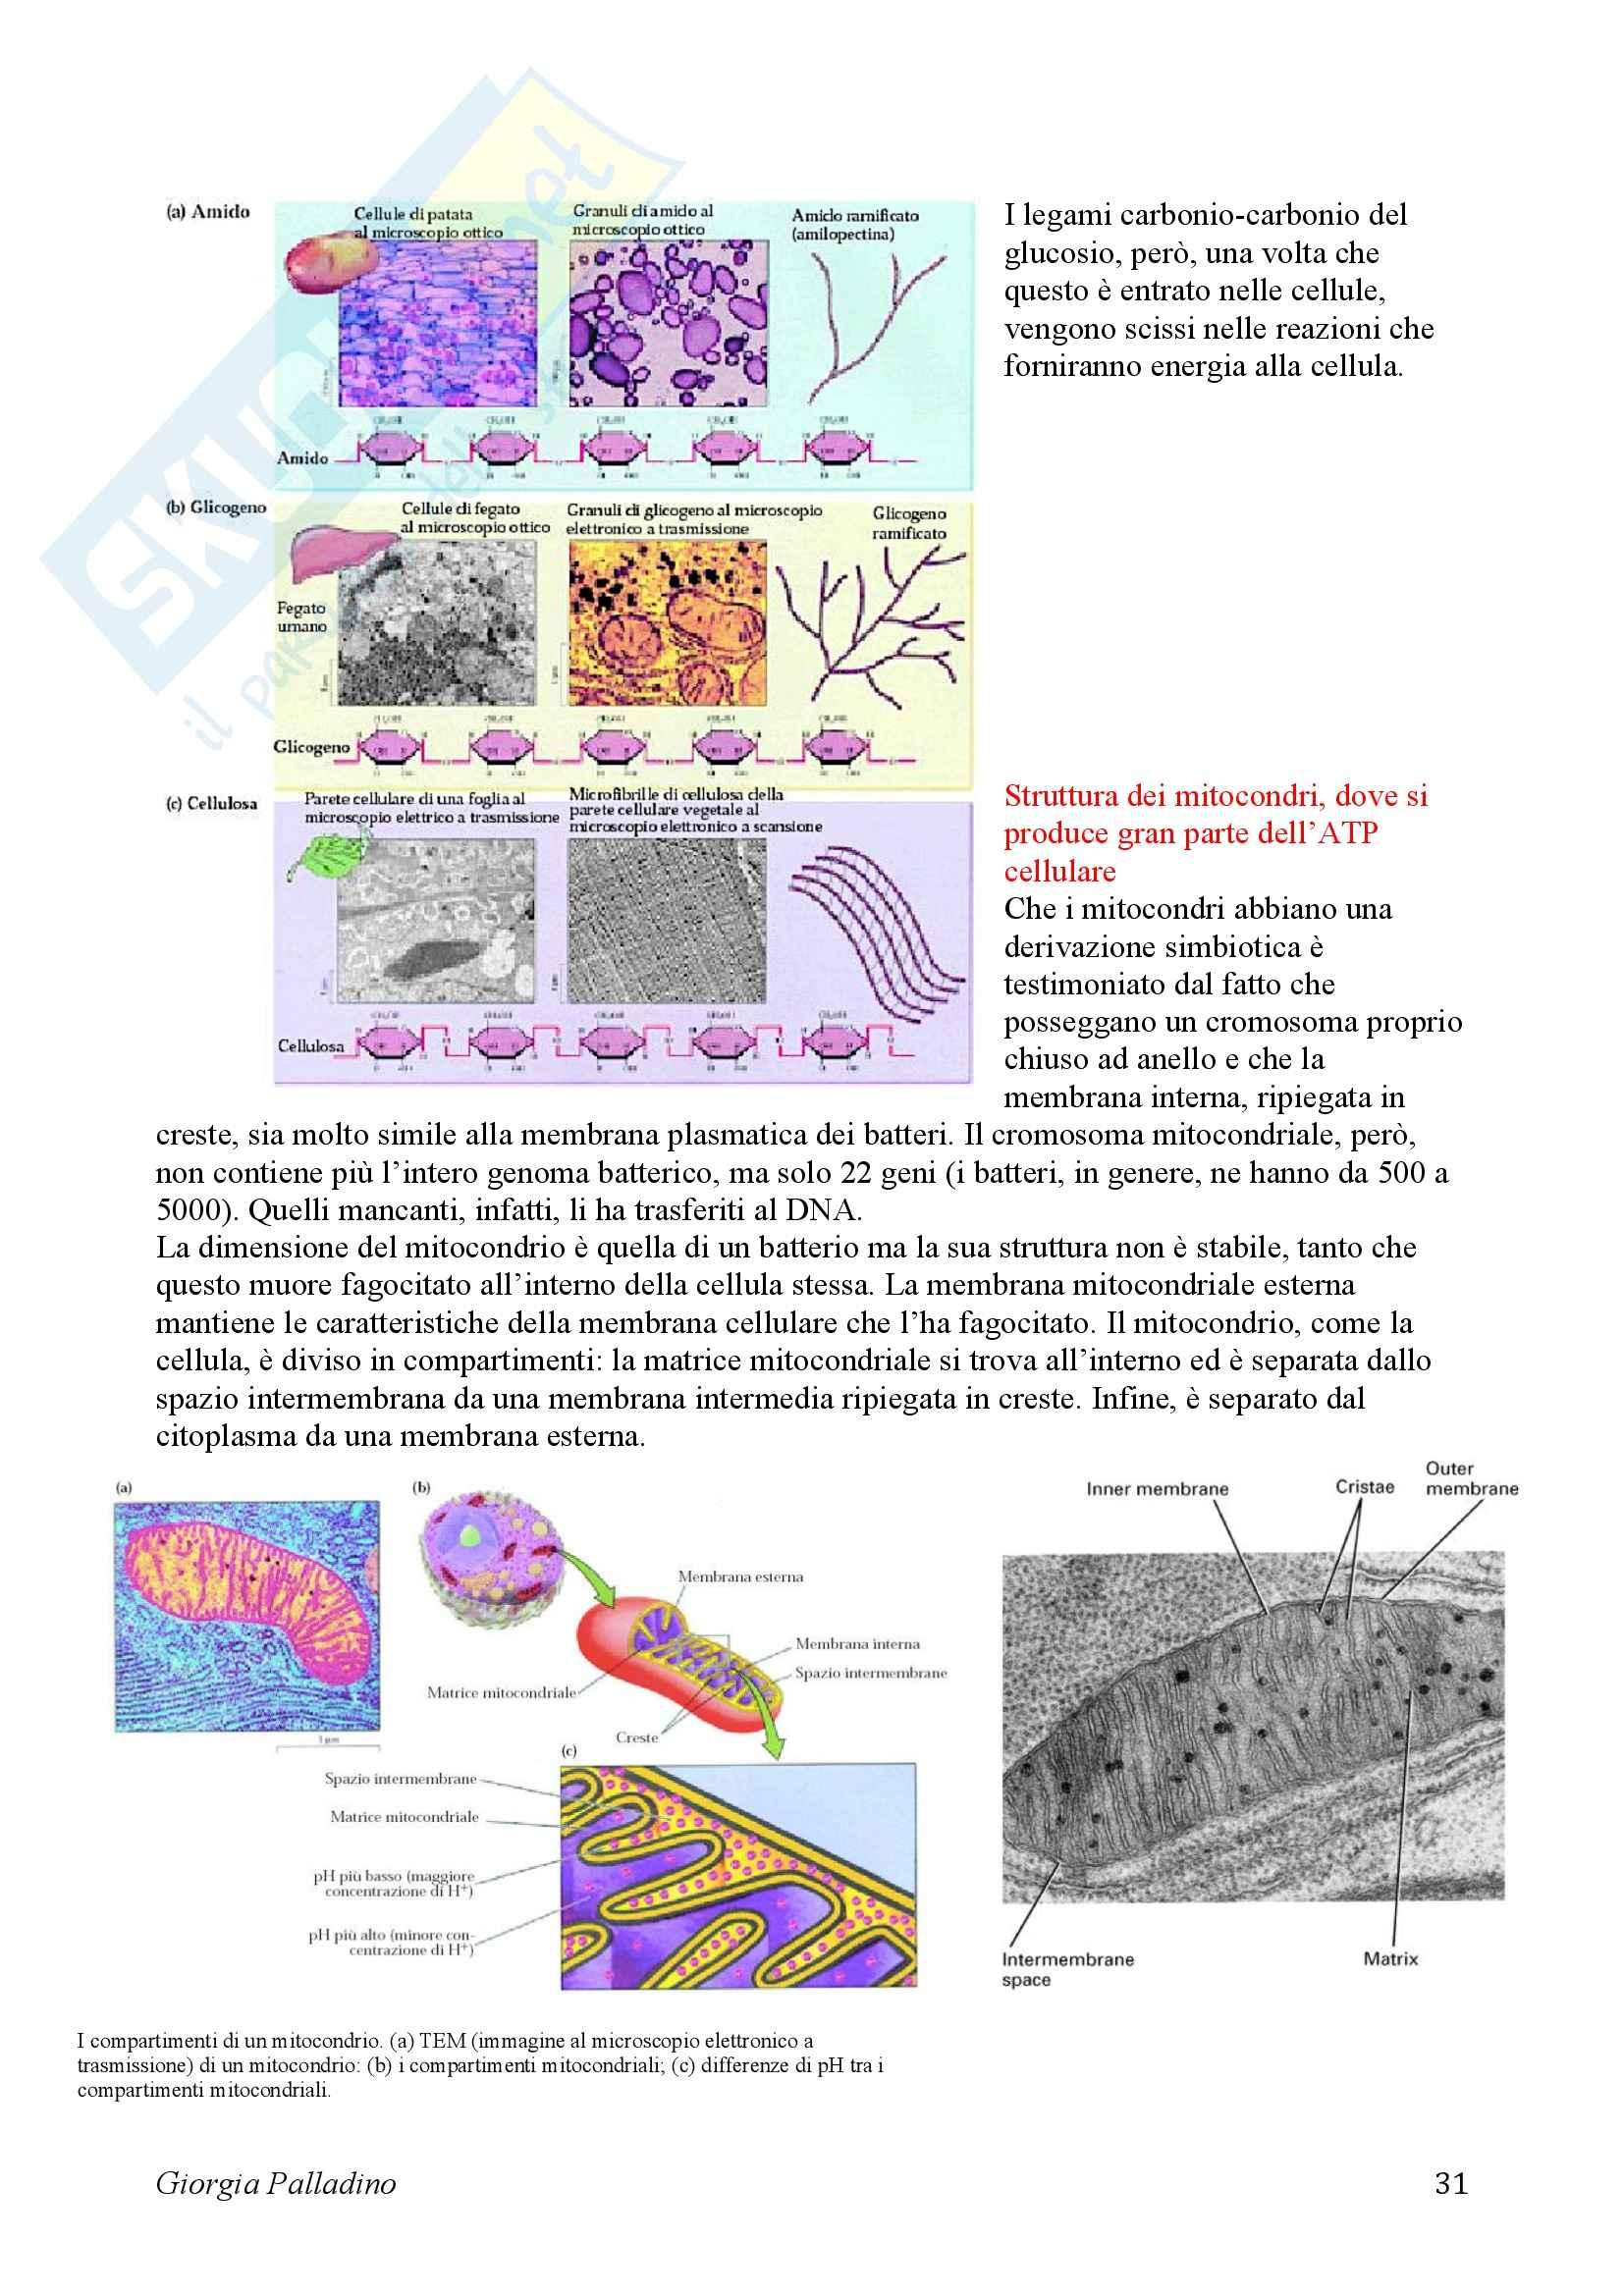 Biologia Cellulare Pag. 31